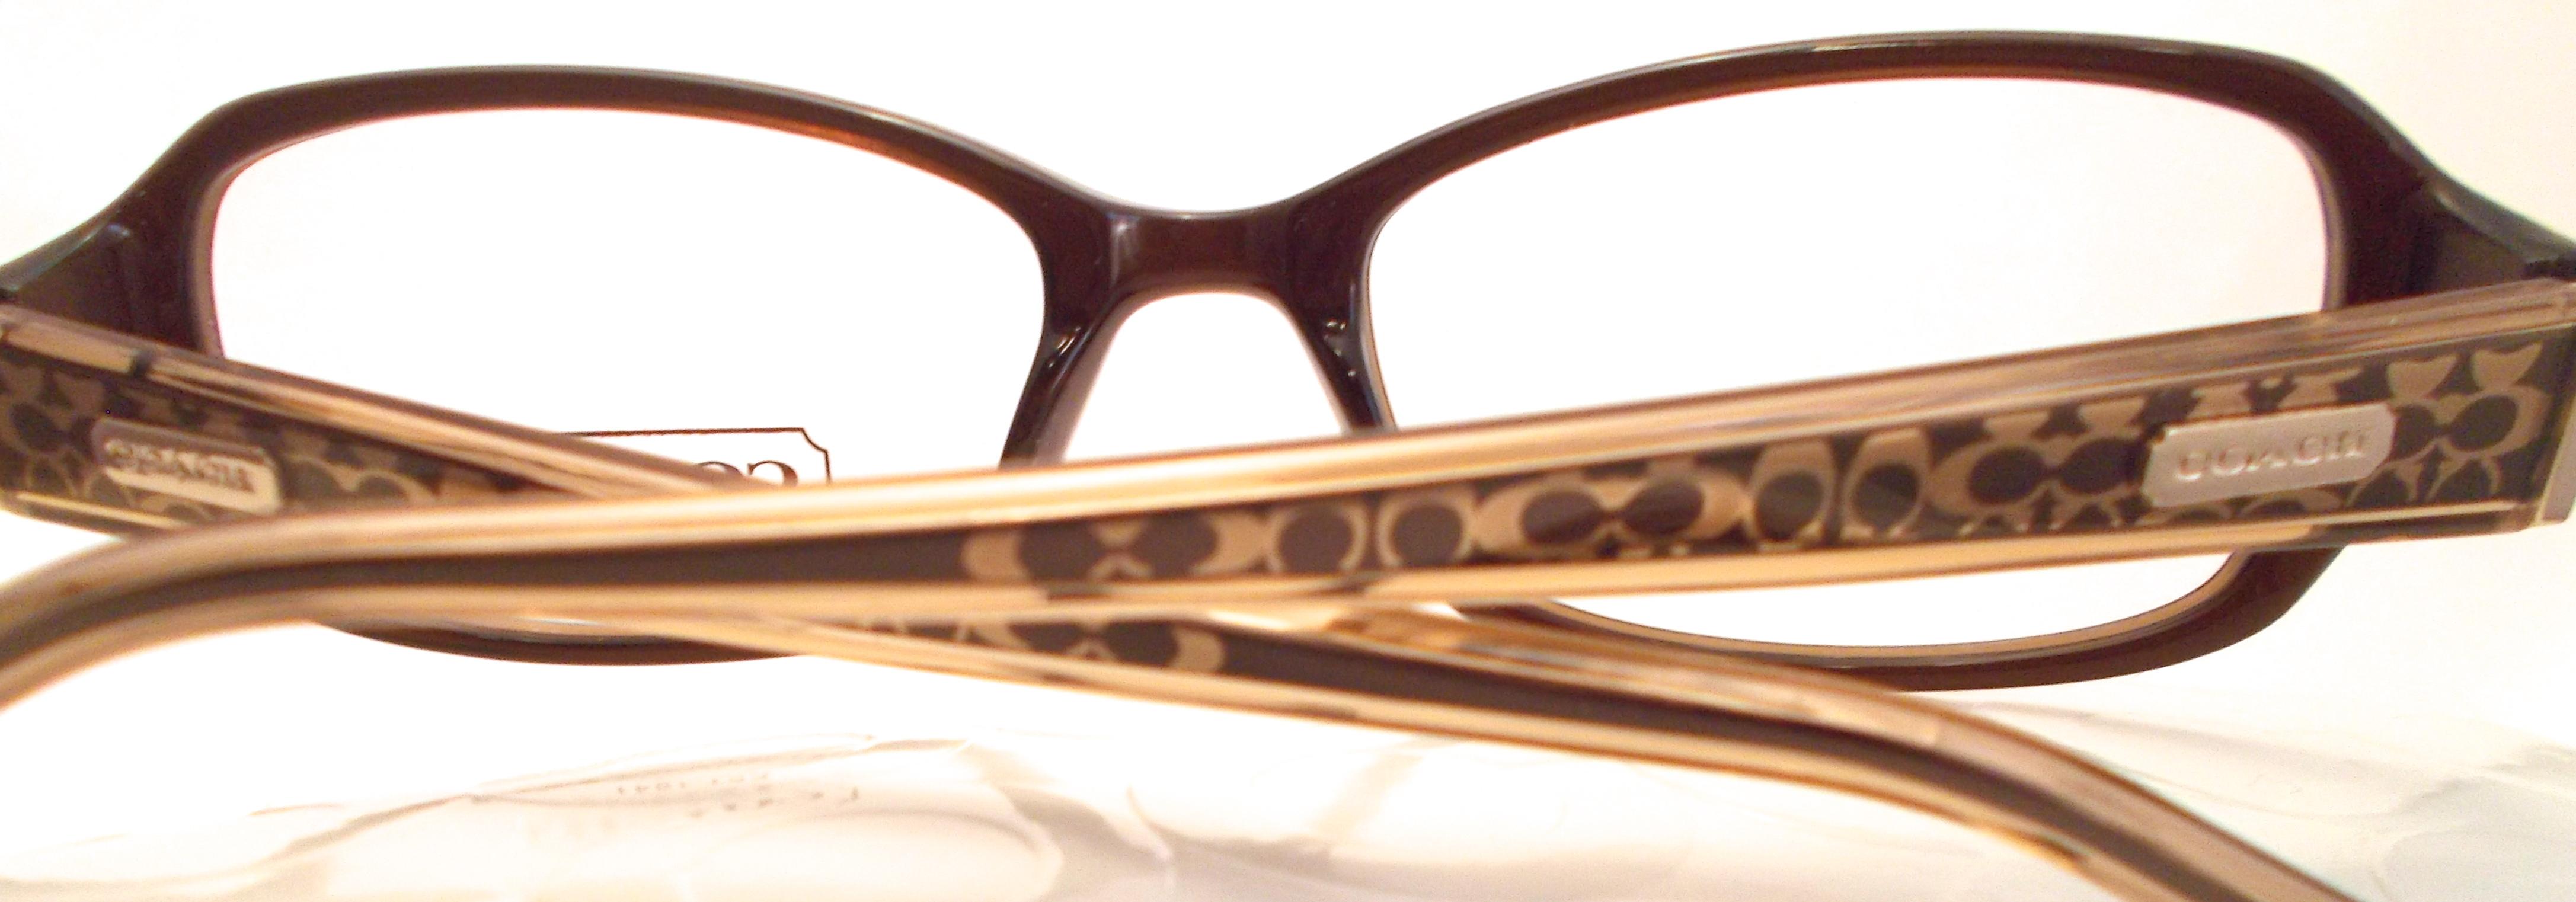 Coach Midori 2036 Eyewear on Storenvy